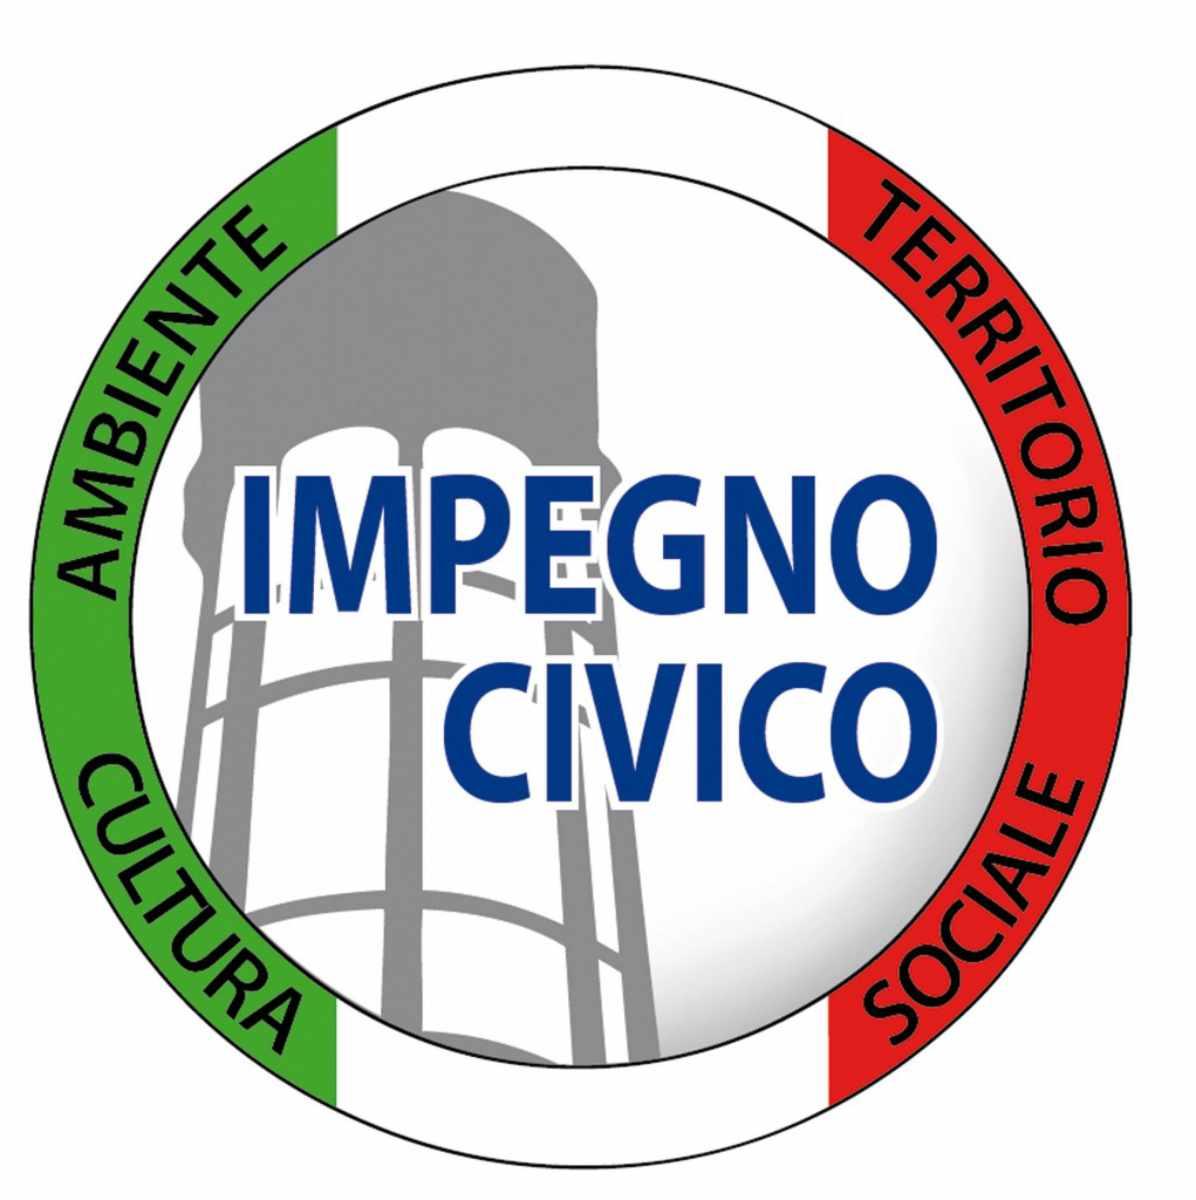 logo impegno civico